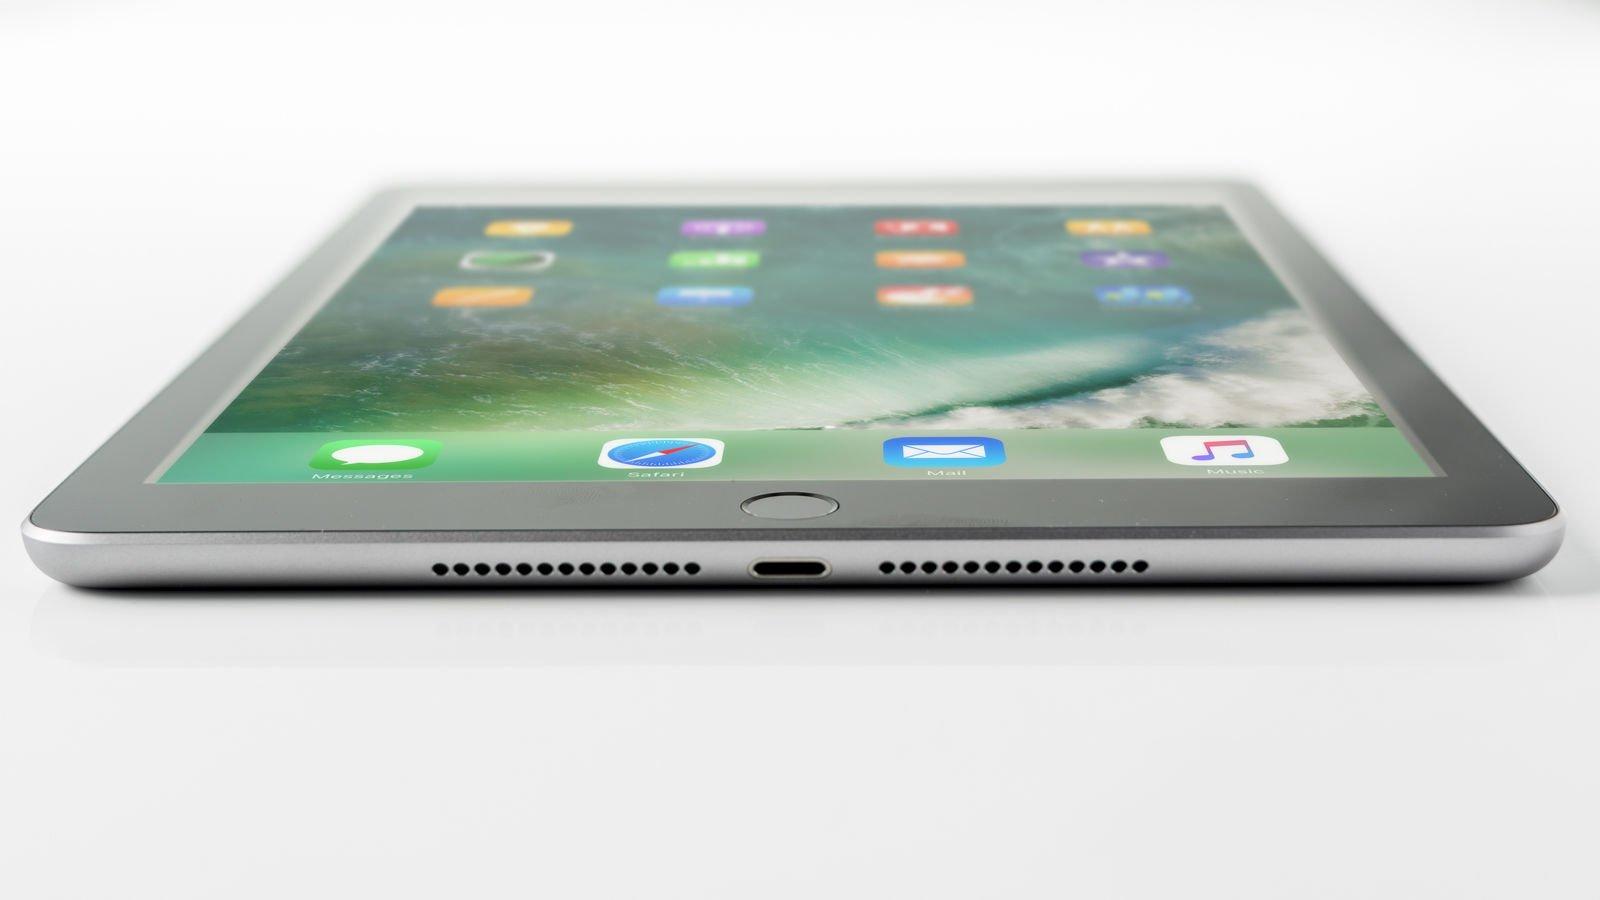 How to use an iPad: Lightning port